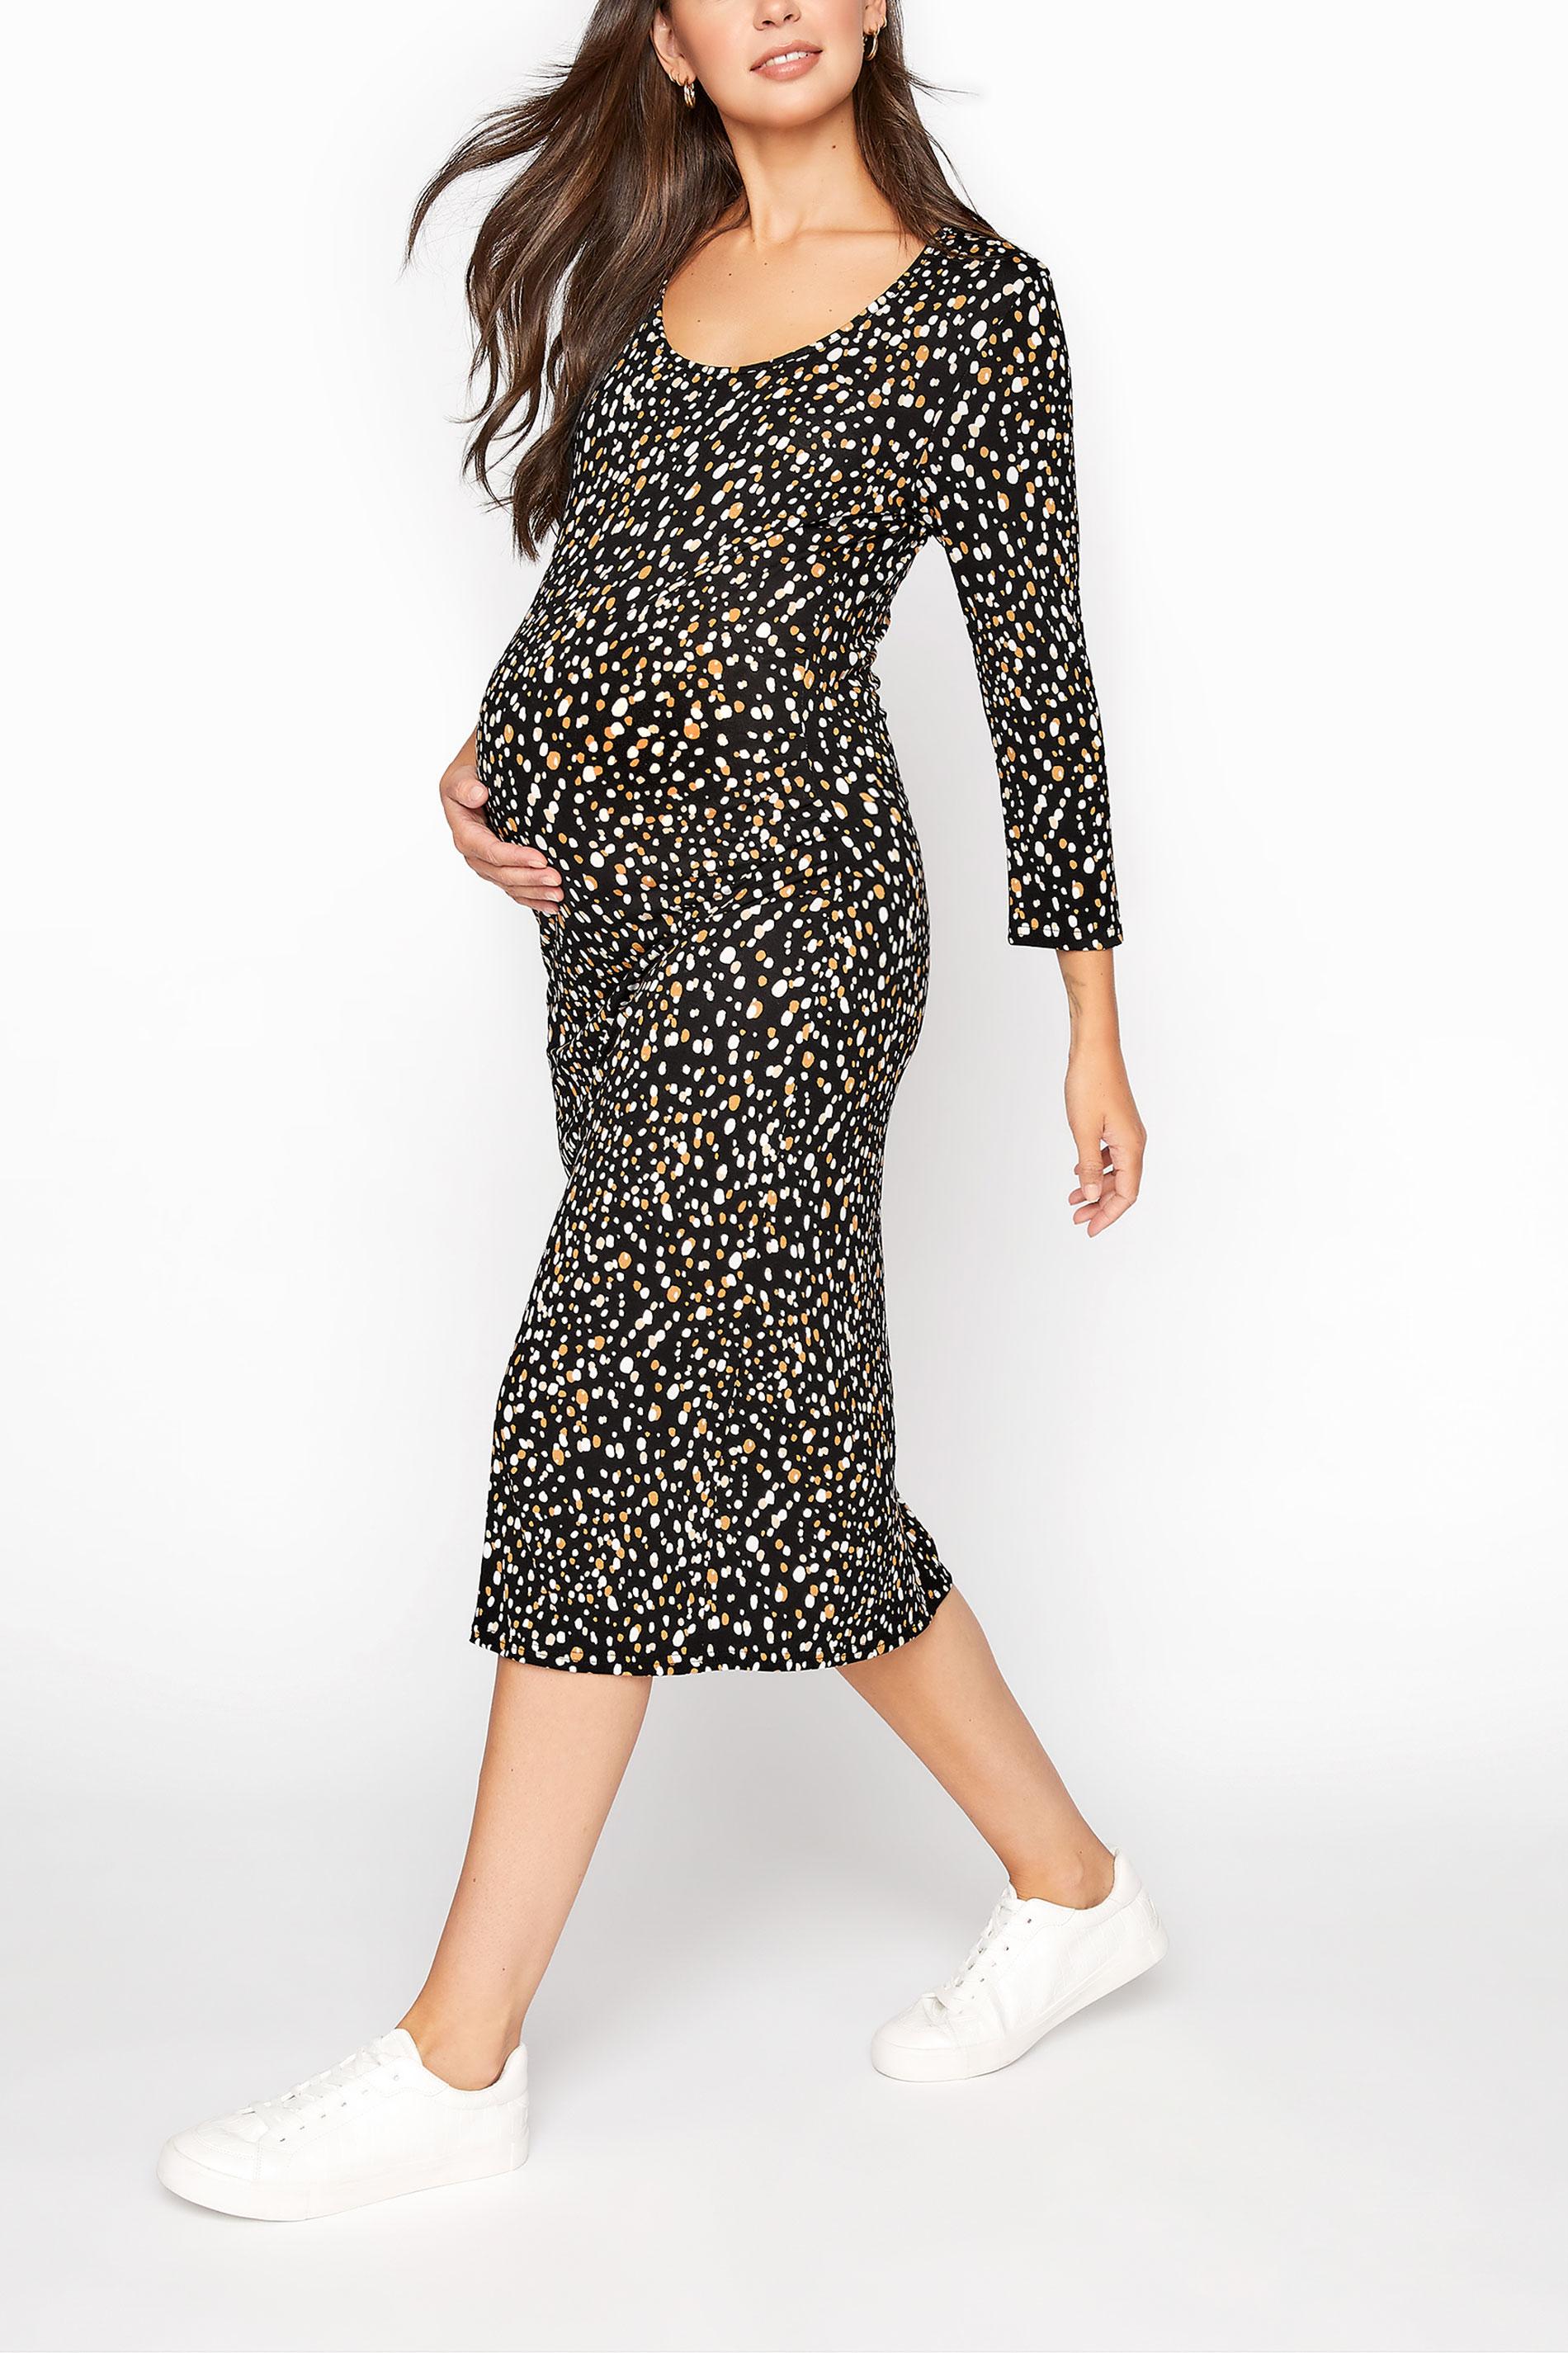 LTS Maternity Black Spot Bodycon Midi Dress_A.jpg